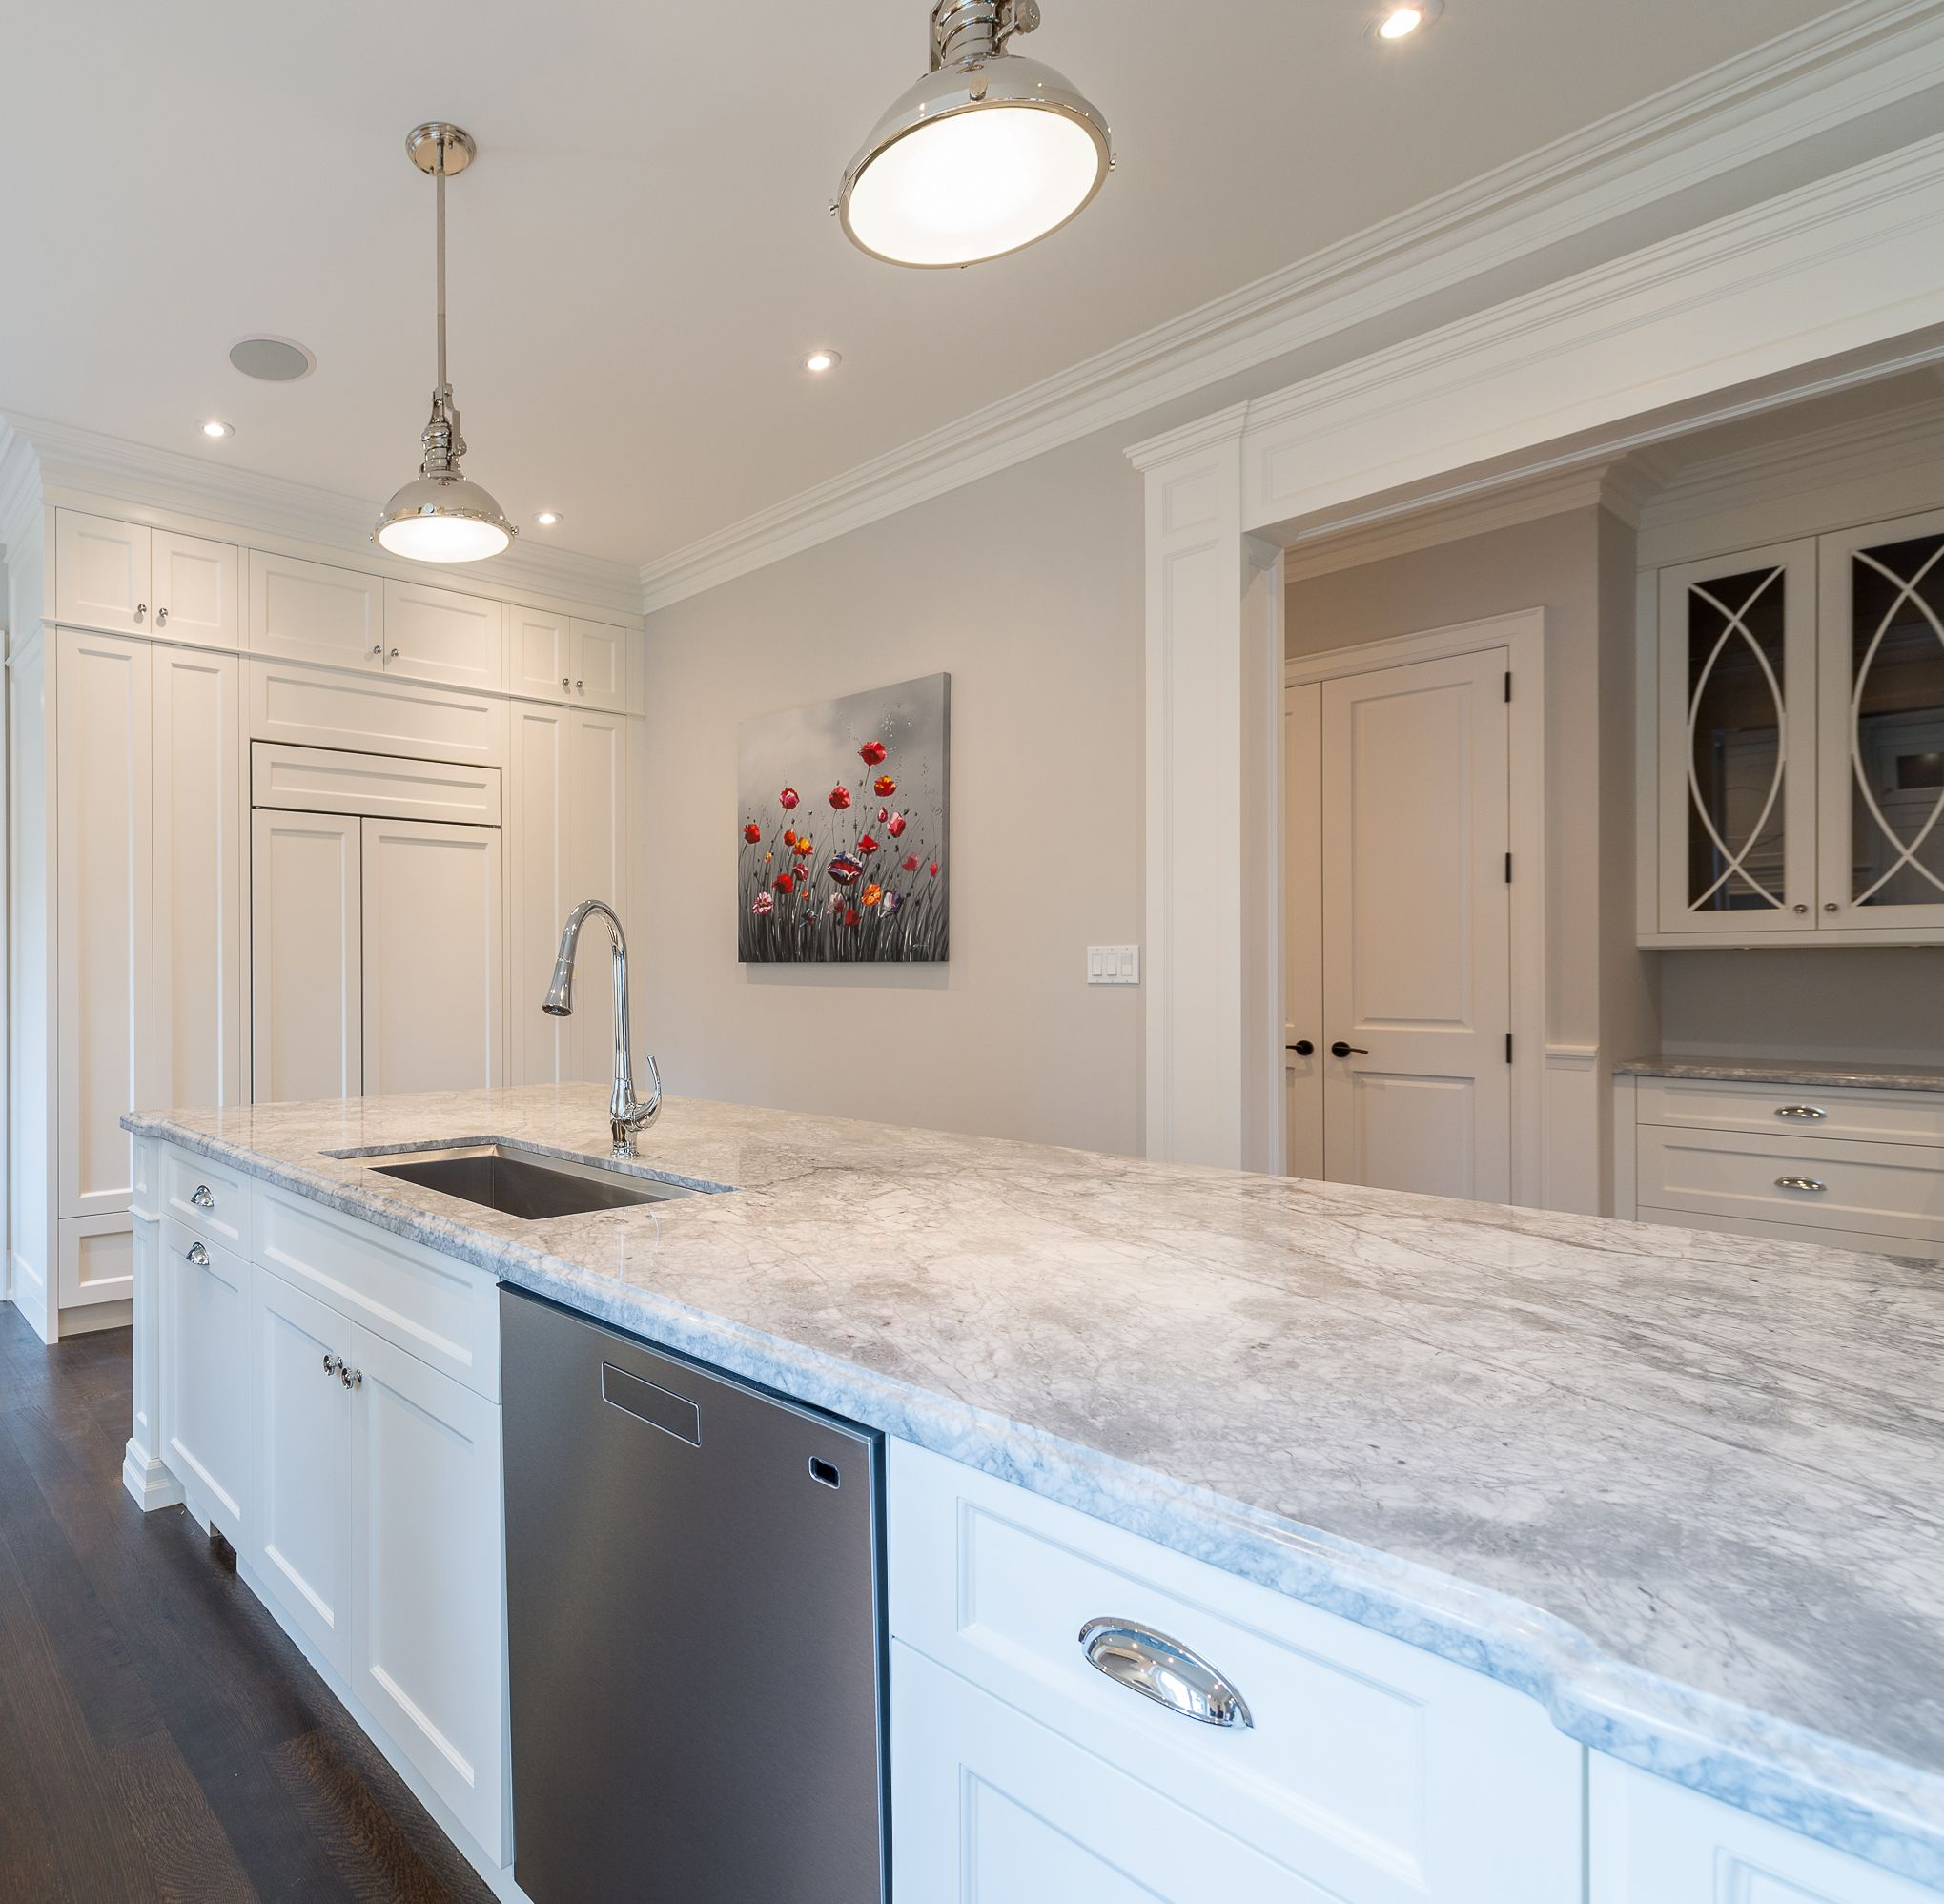 White apron gainesville fl - White Kitchen Ideas Super White Granite Cc40 Cabinetry Decorative Hood Wolf Range